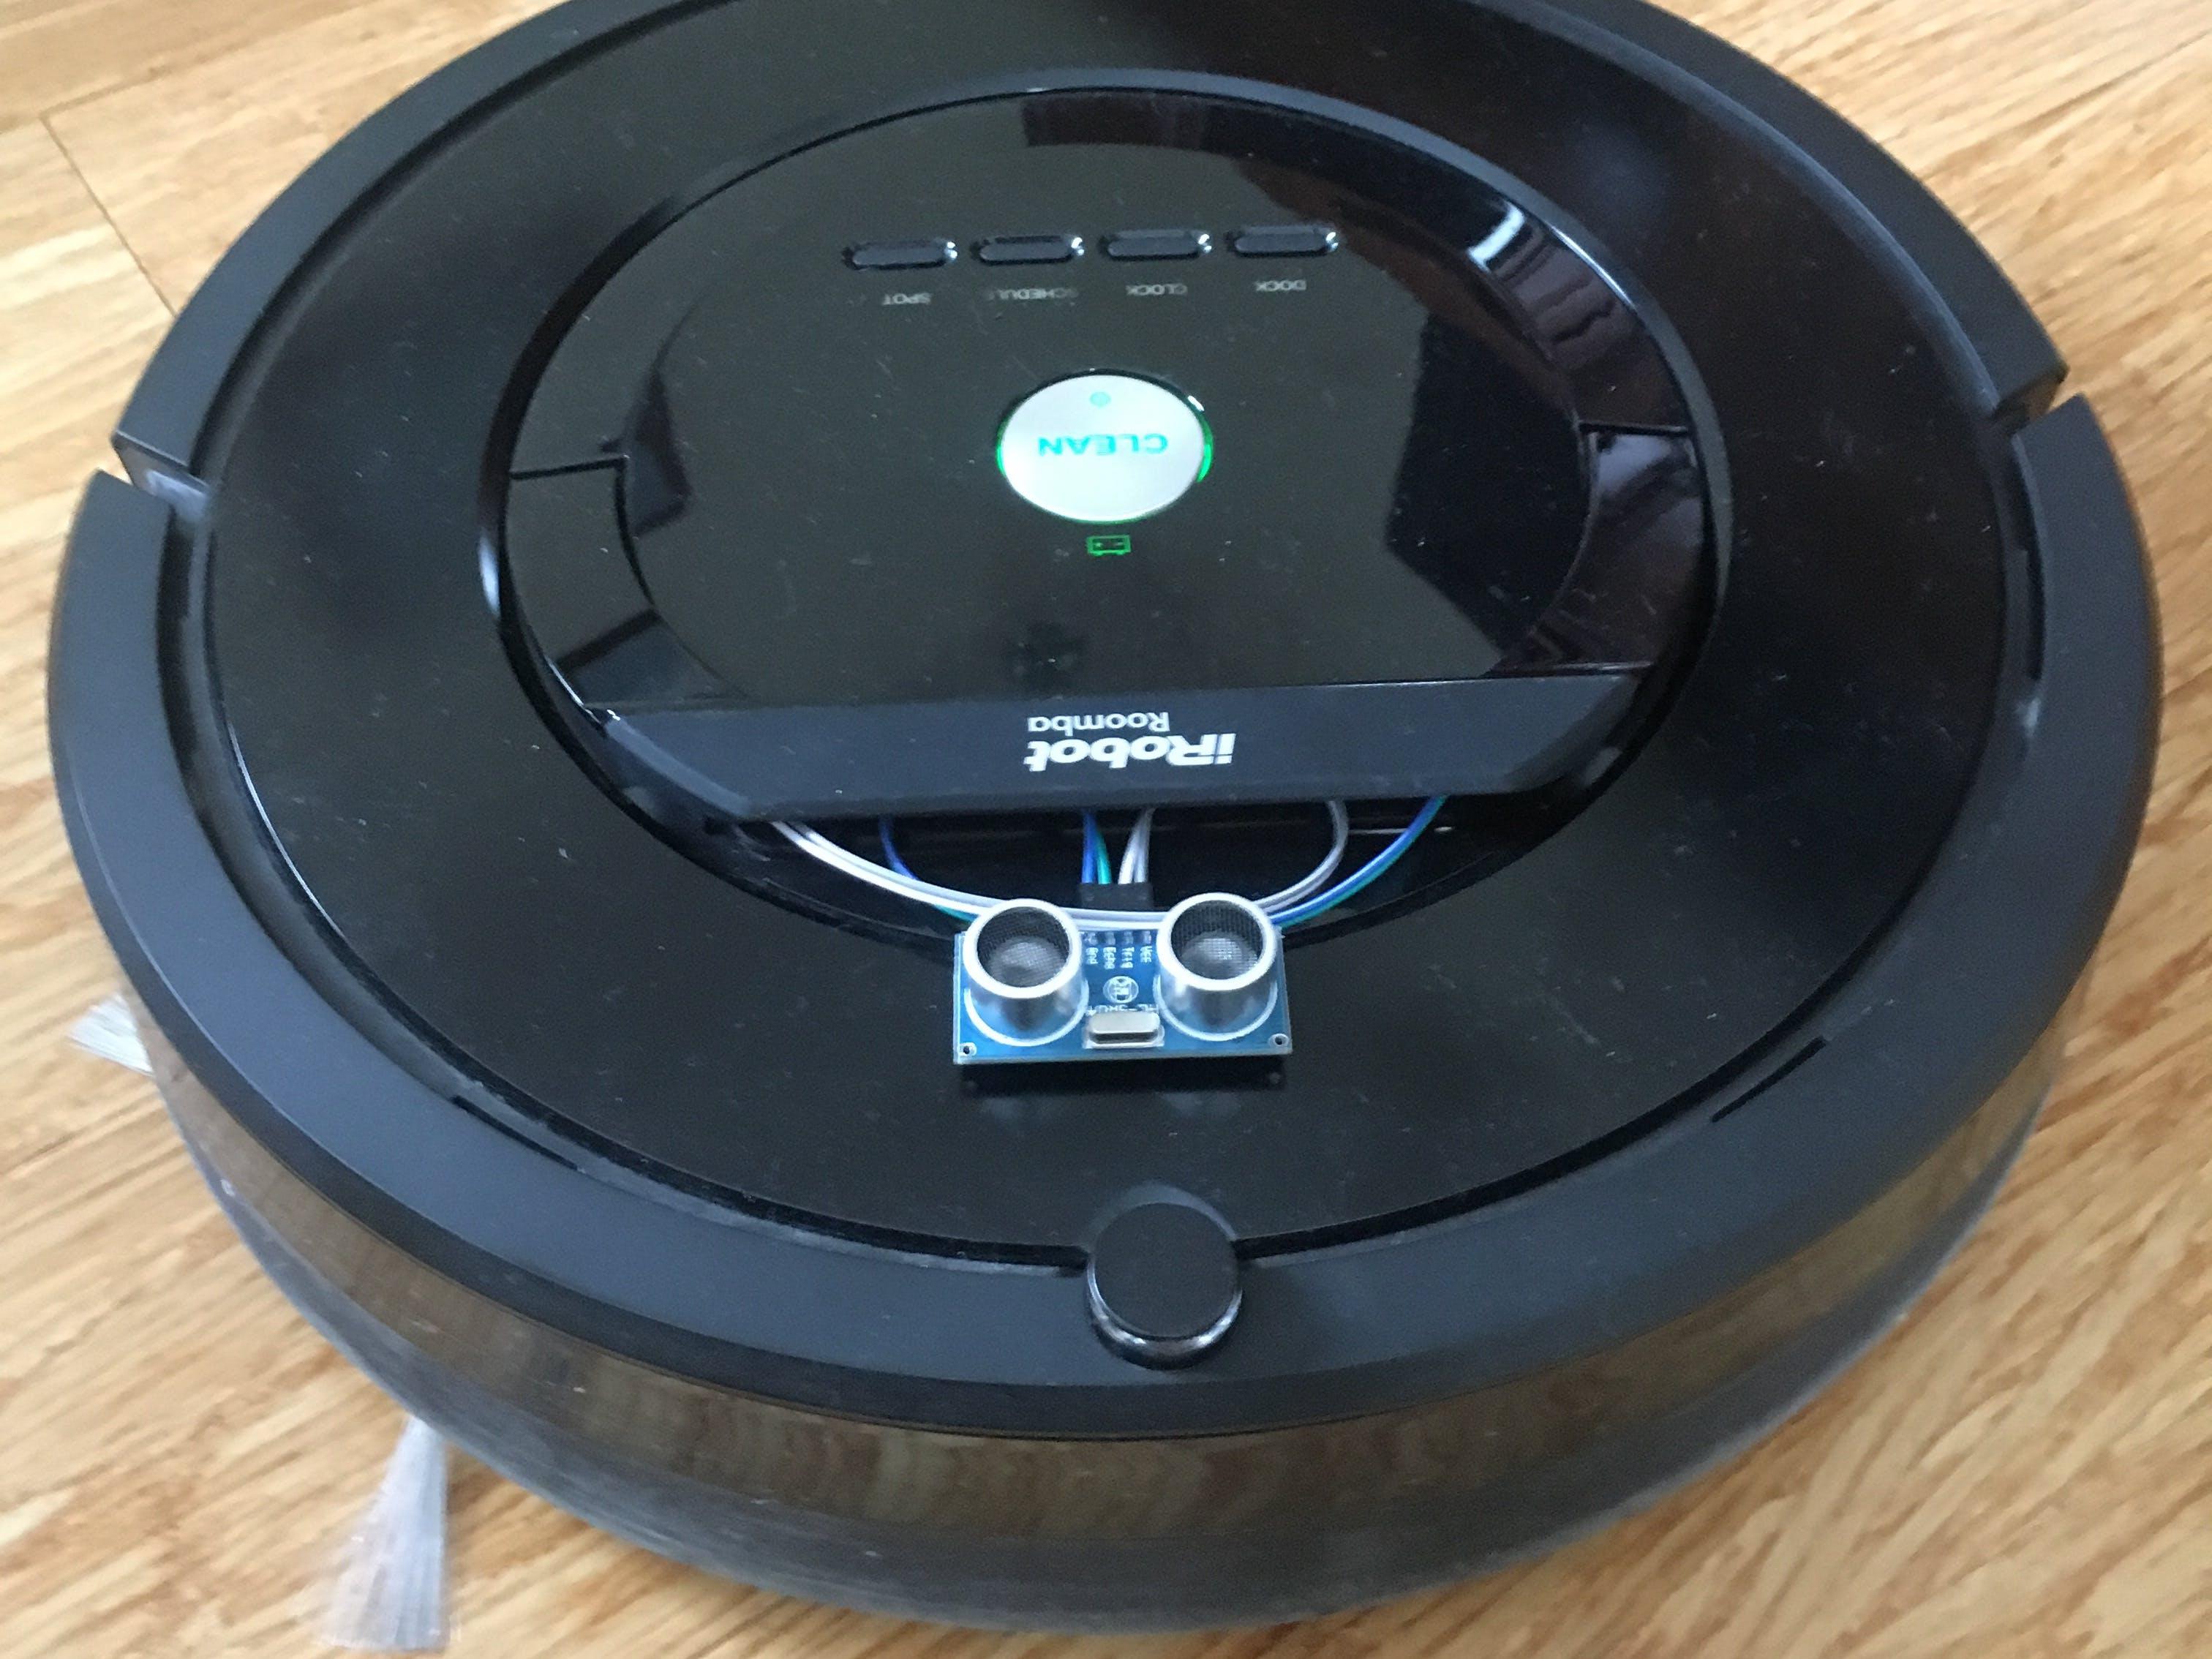 Making Roomba Smarter (800 Series)